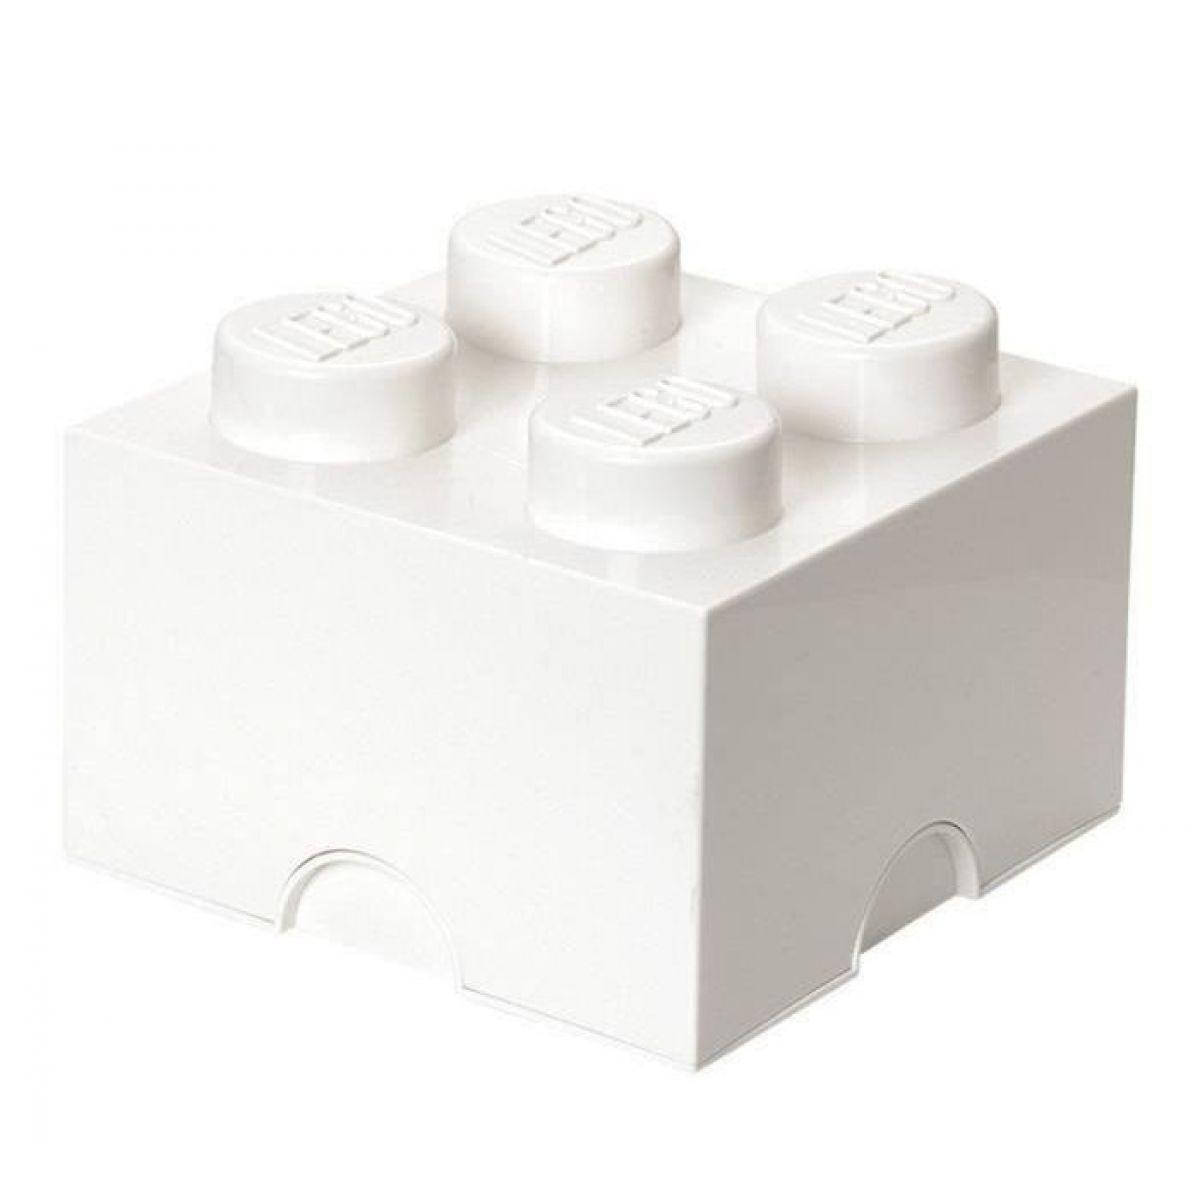 LEGO úložný box 25 x 25 x 18 cm biely